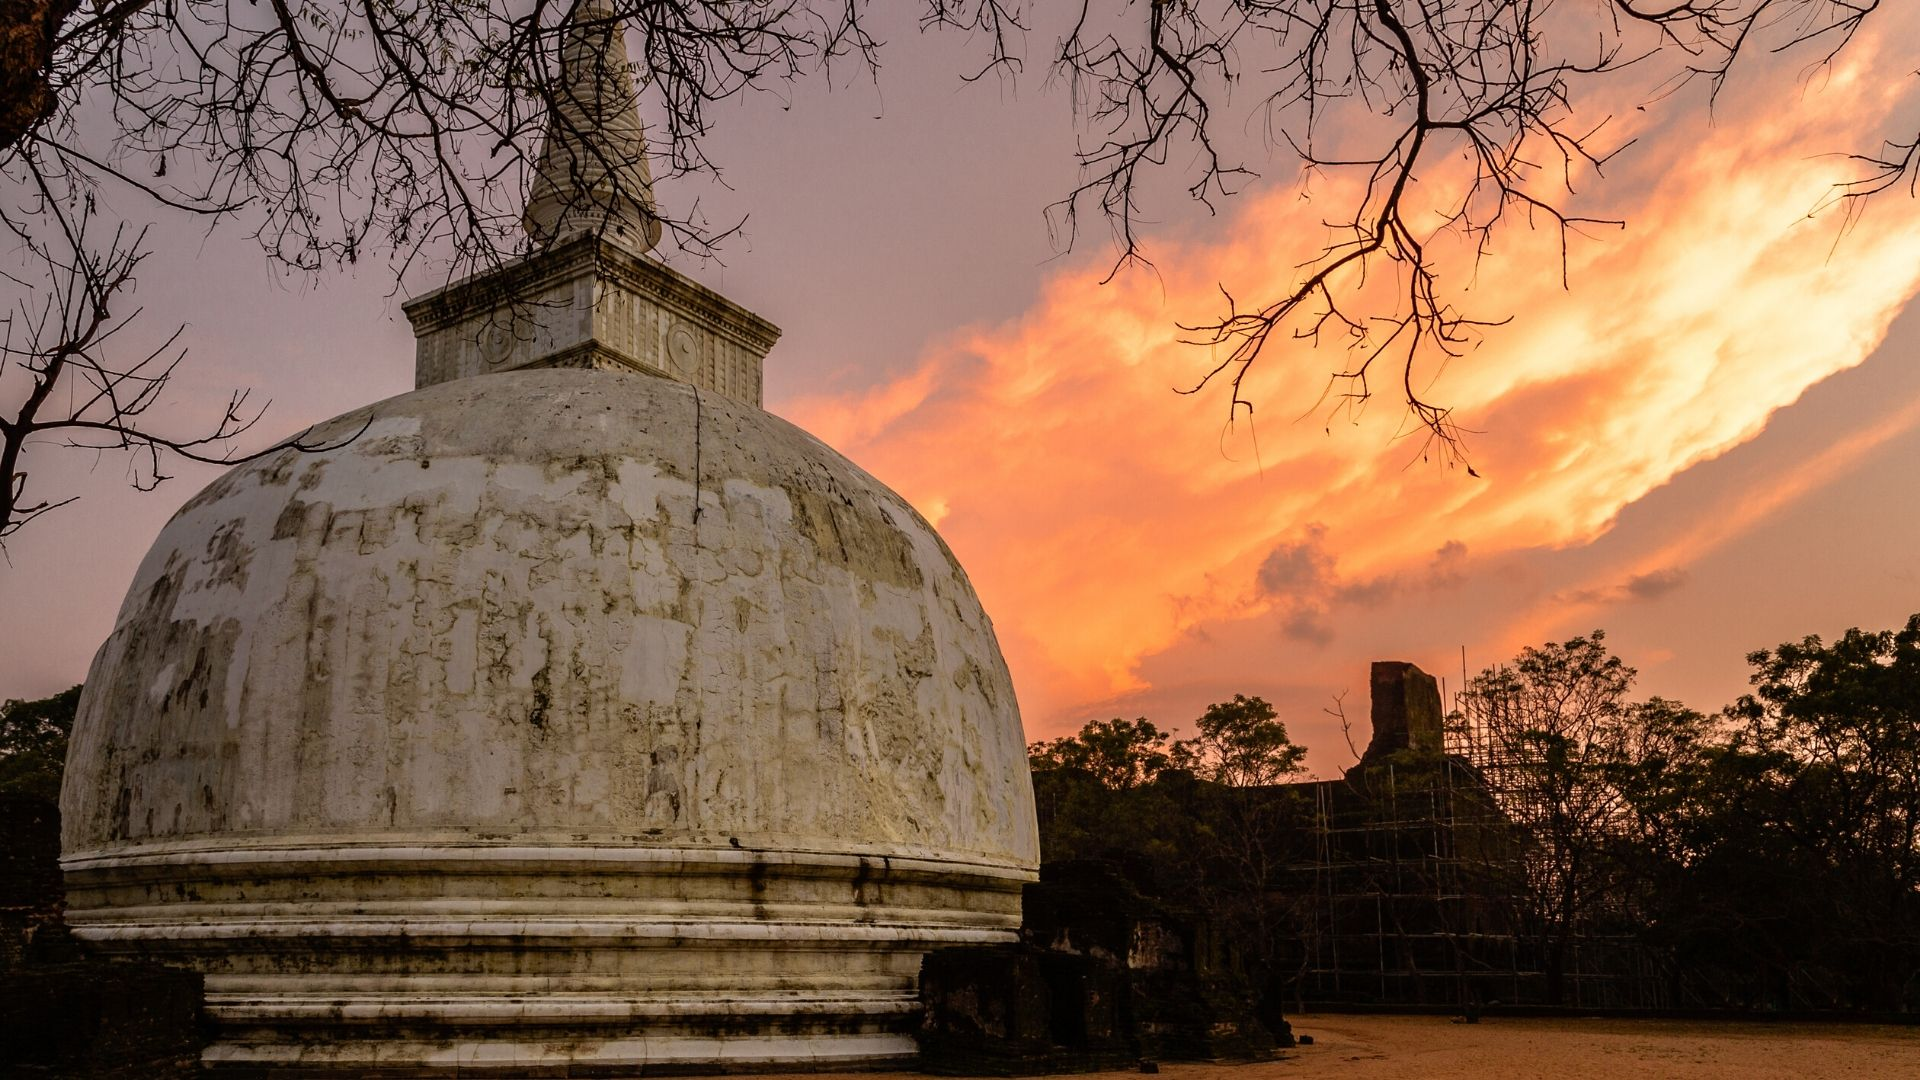 Kiri Vehere Polonnaruwa Sri Lanka